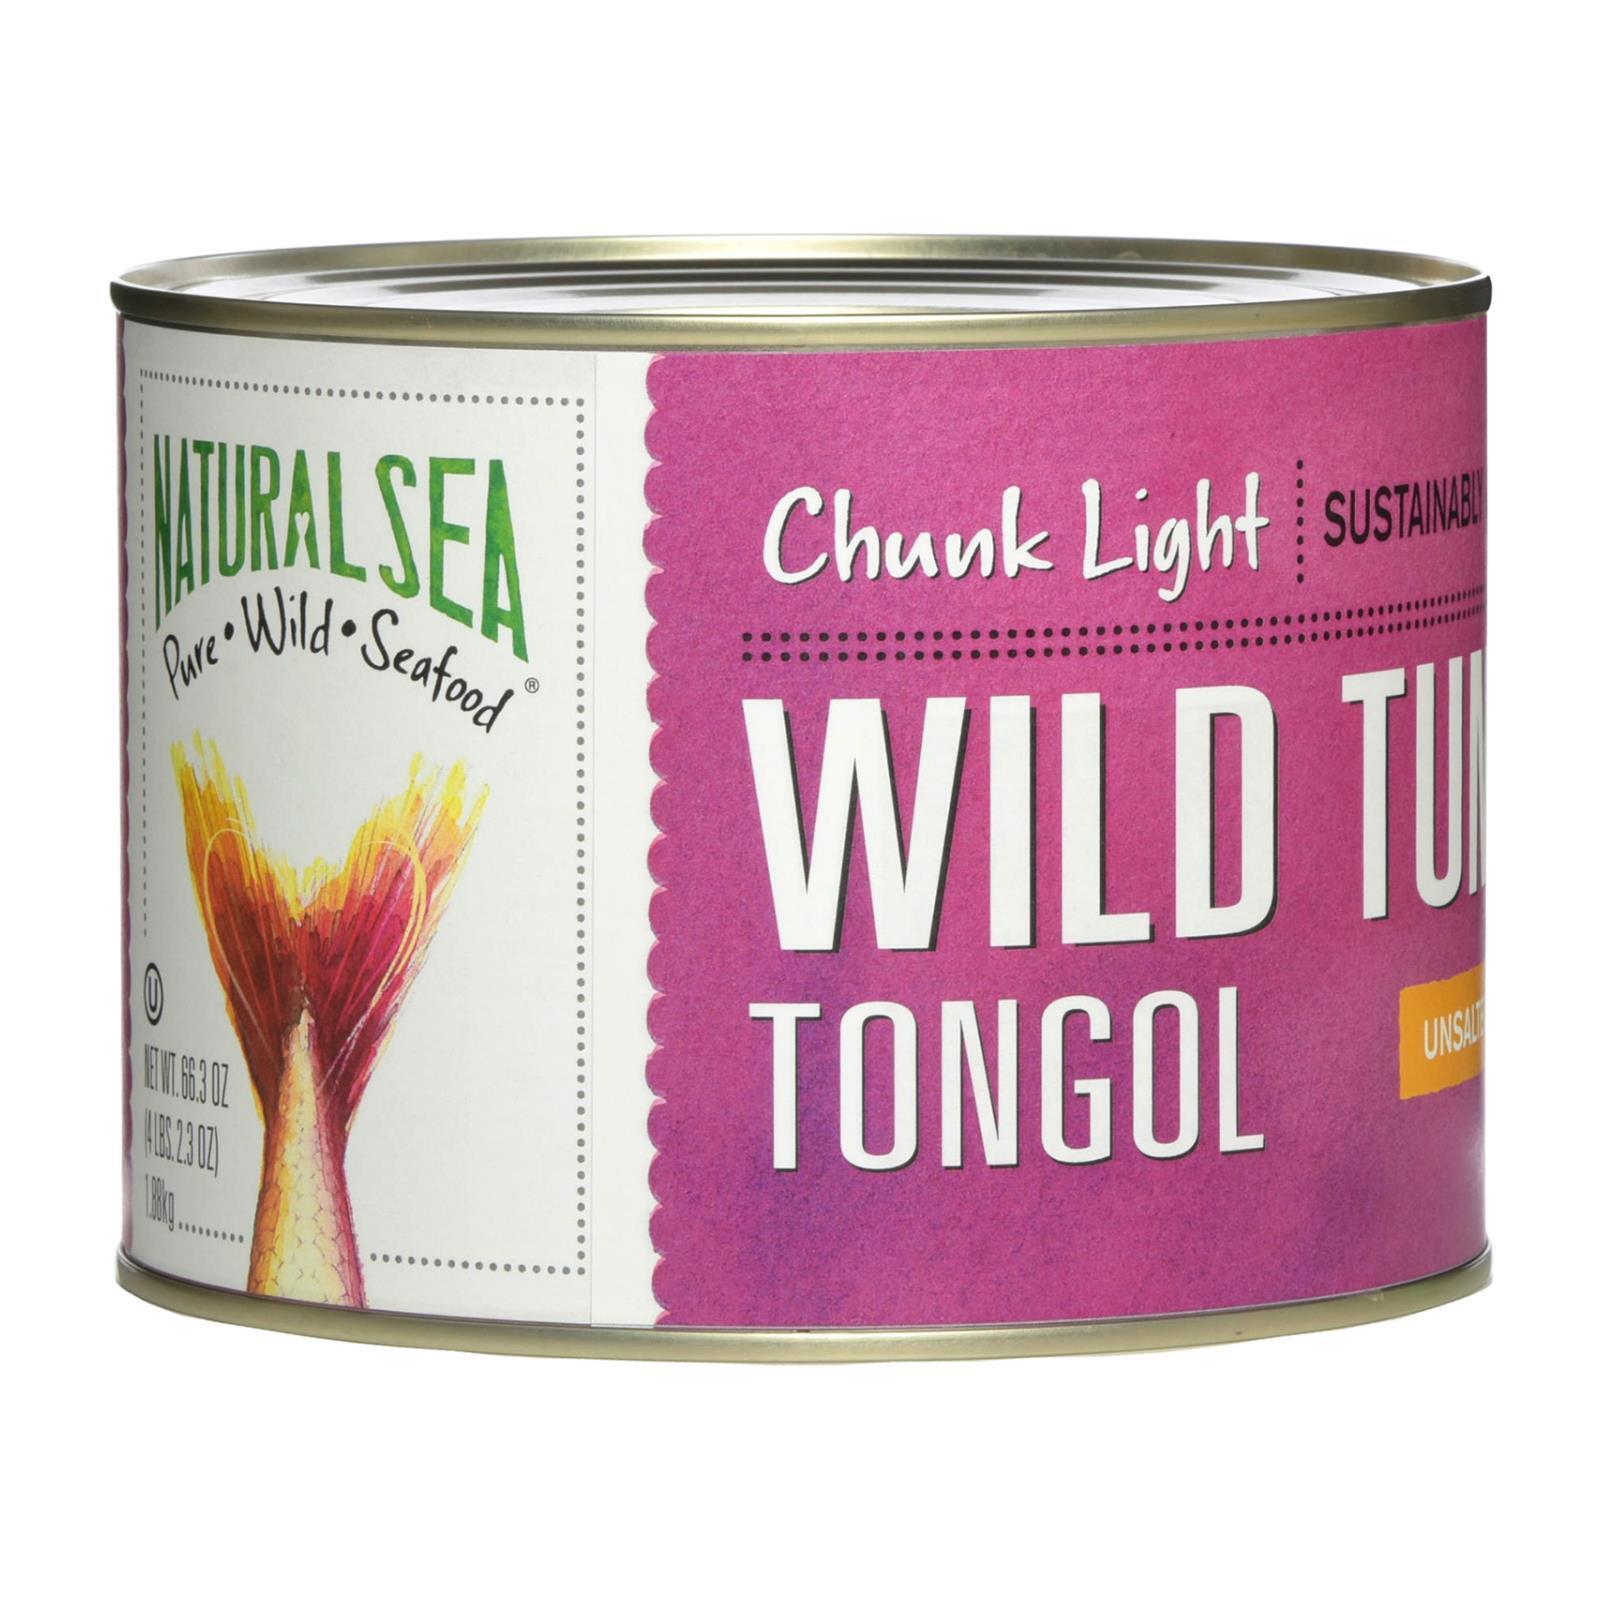 Natural Sea Tuna - Tongol - Chunk Light - No Salt Added - 66.5 oz - case of 6